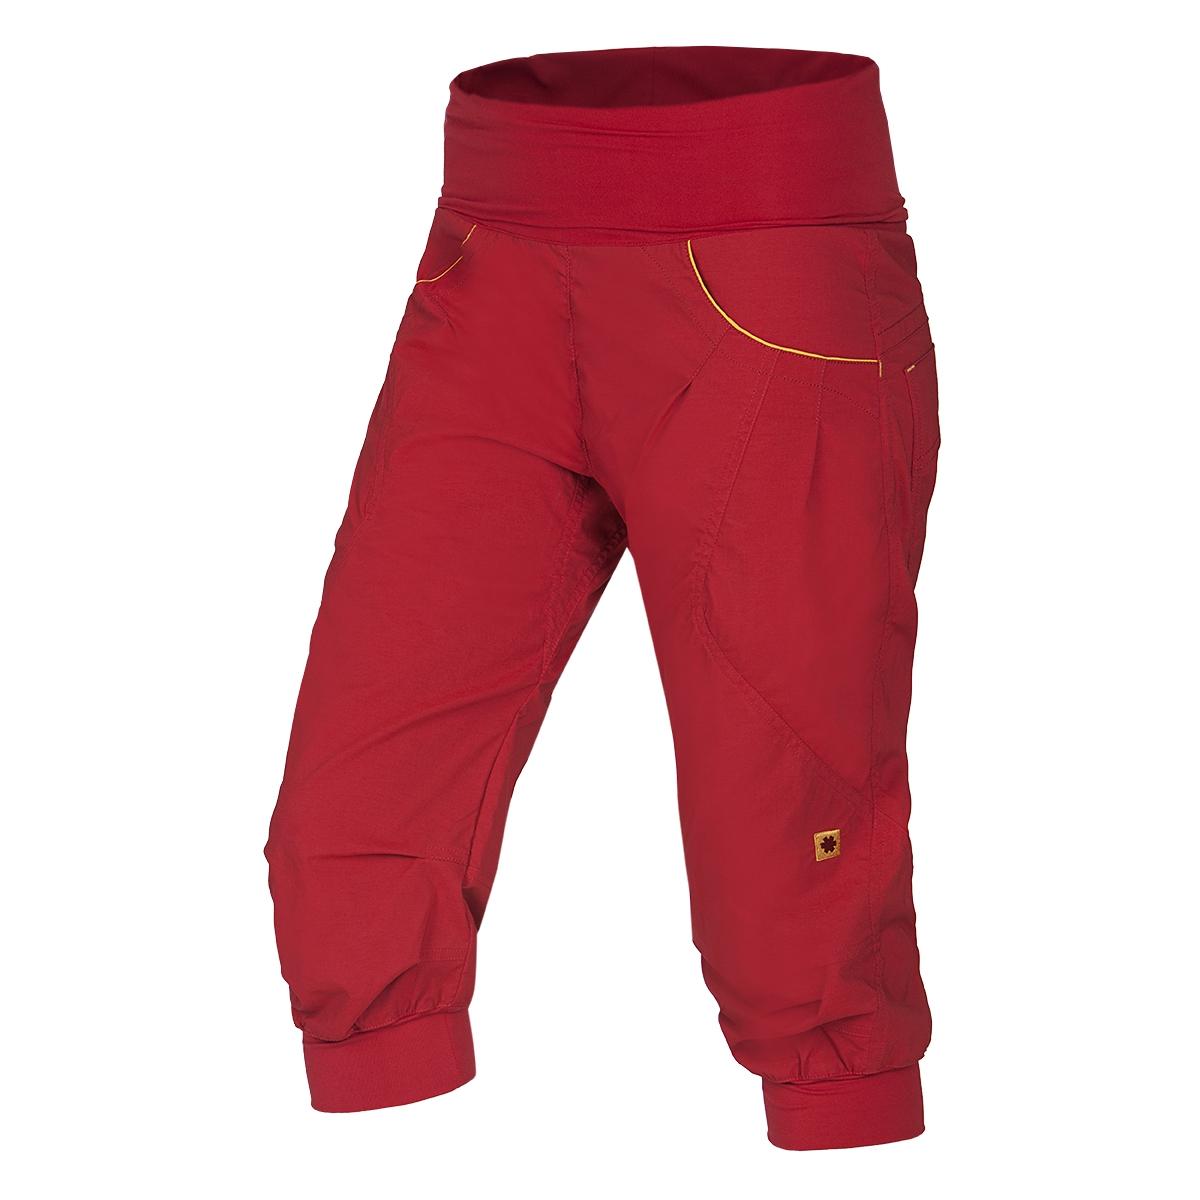 Ocún Noya Shorts Women Barva oblečení  Red Yellow 3f4ed9d623